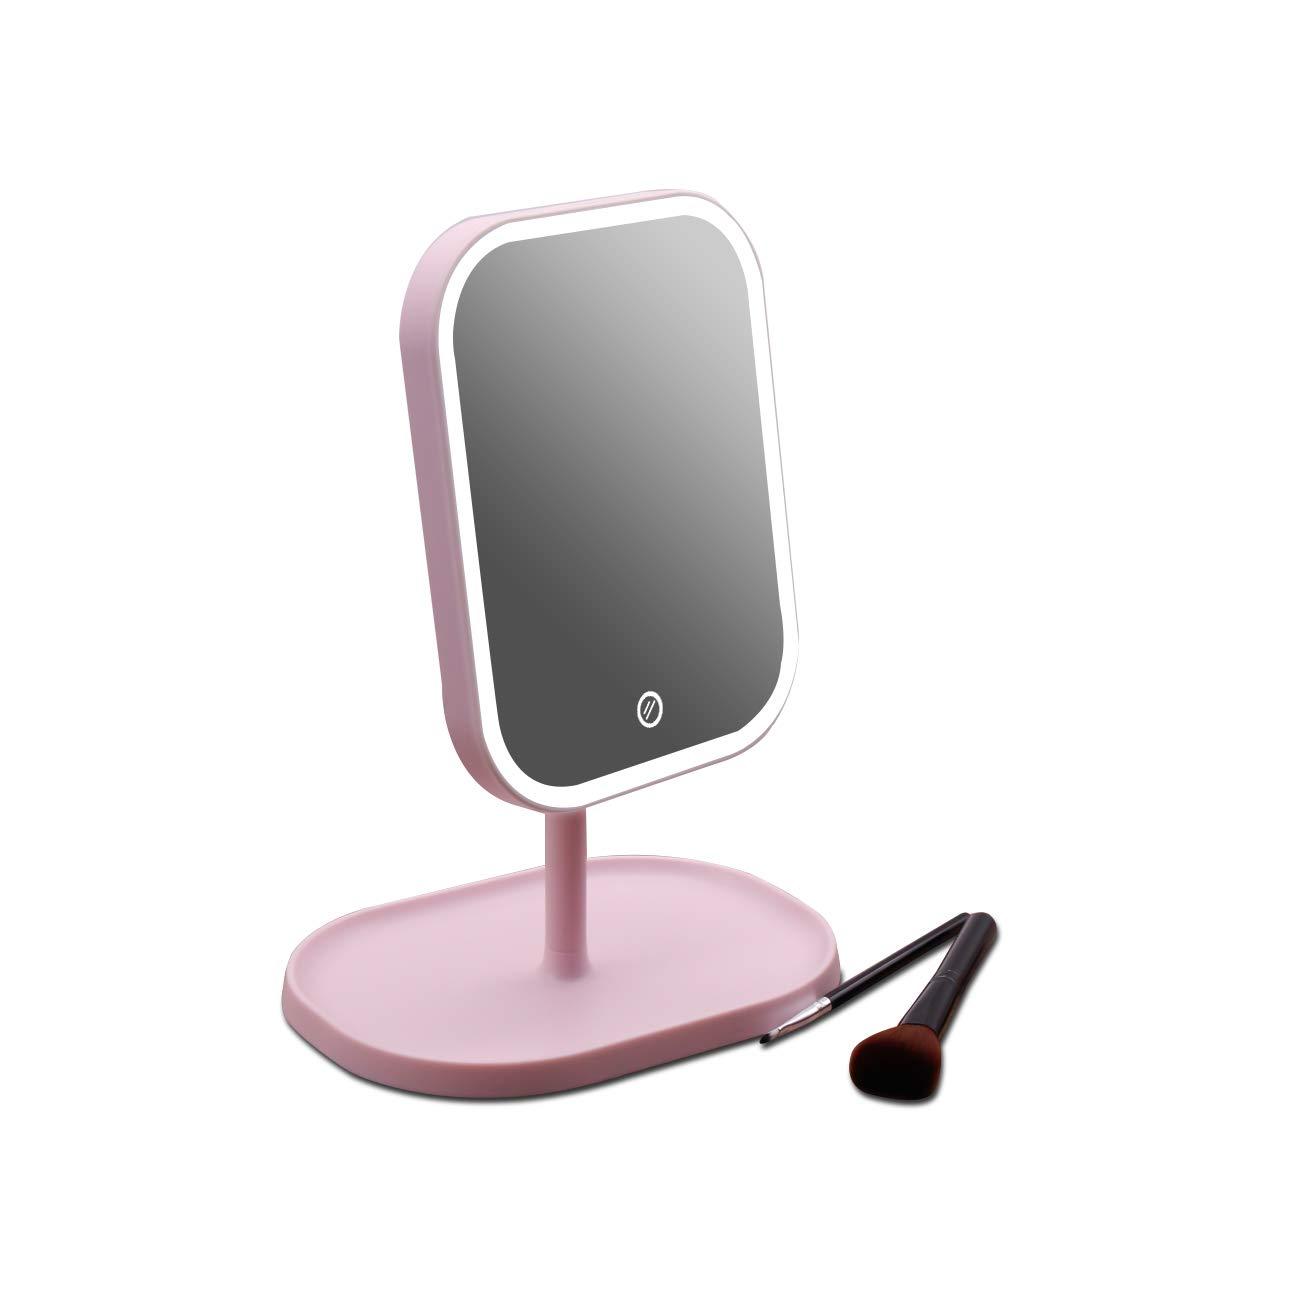 AODAILIHB Simple Square Removable LED Makeup Mirror Rotary Folding Traveling Mirror Light Brightness Adjustable …